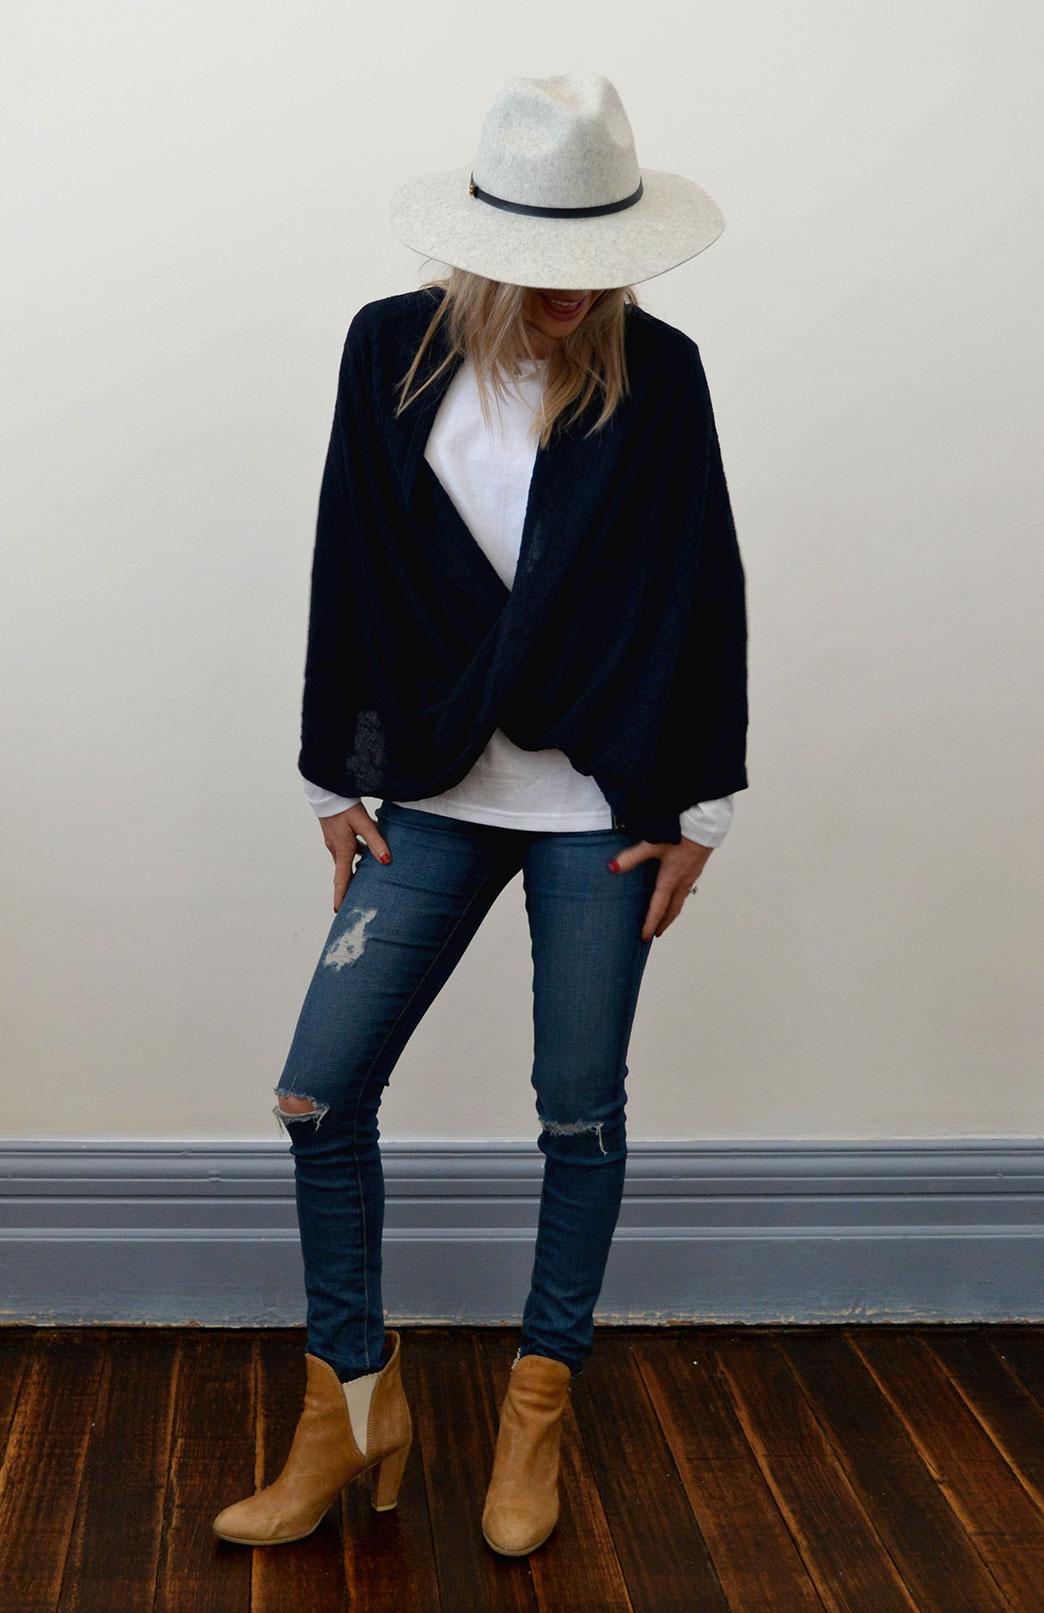 Merino Twisted Wrap - Women's Merino Wool Dark Navy Blue Twisted Wrap and Classic Shrug - Smitten Merino Tasmania Australia